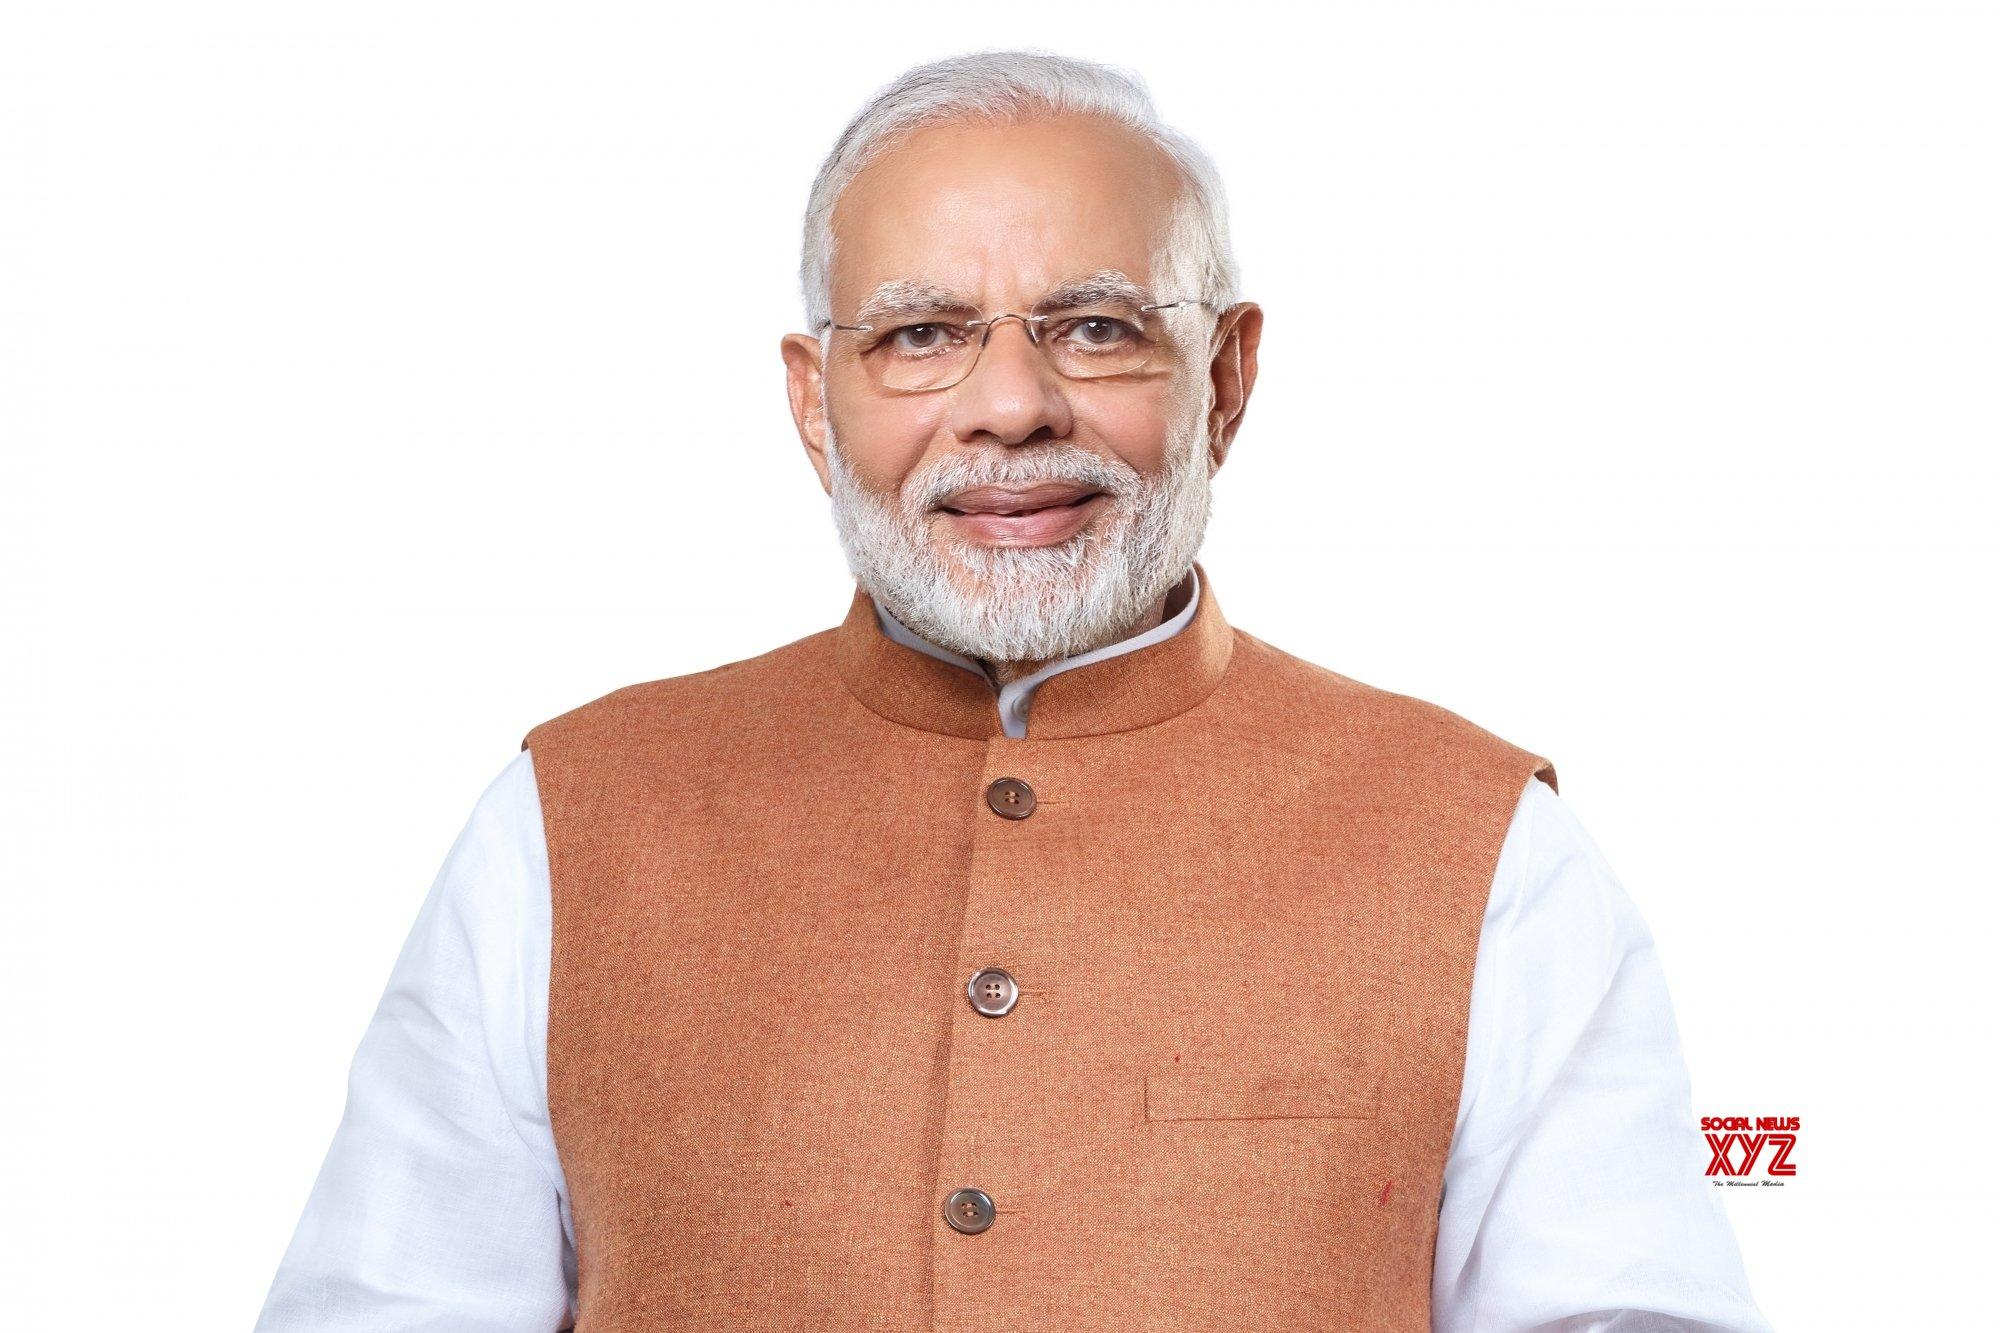 PM to visit Varanasi on Sunday